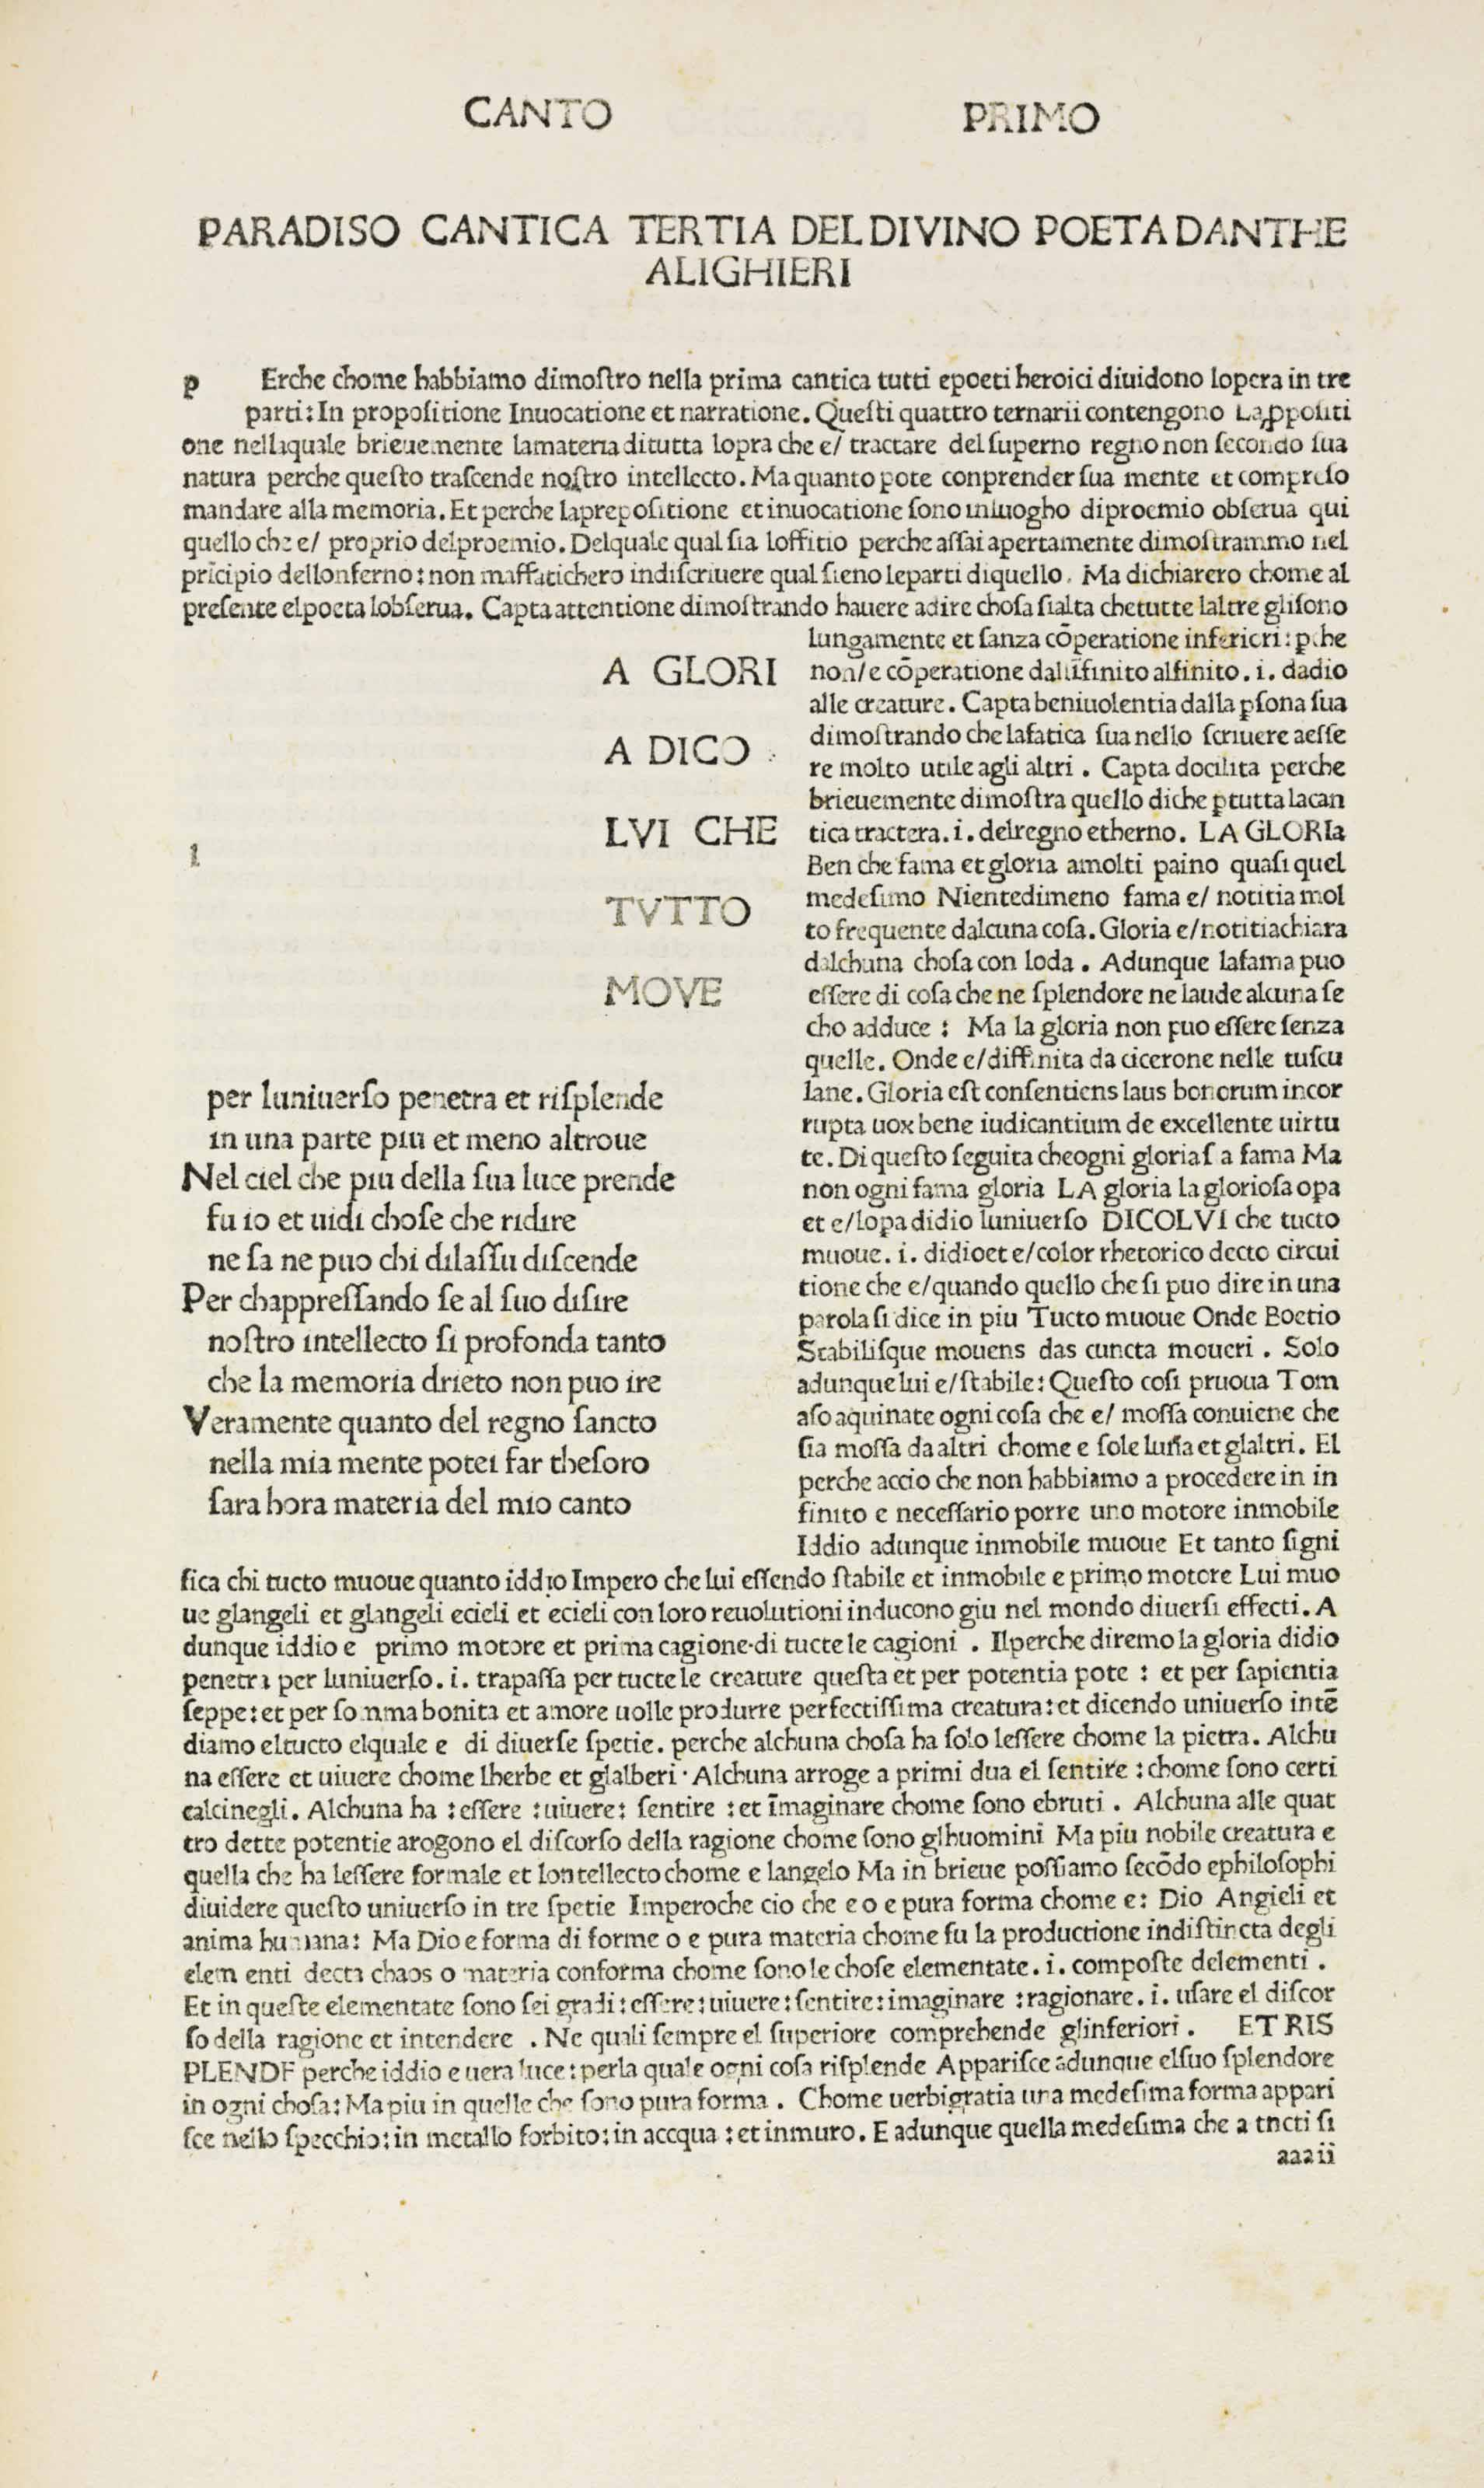 [ROSSETTI, Dante Gabriel (1828-1882)] — DANTE ALIGHIERI (1265-1321). La Commedia. Commentary by Cristoforo Landino (1424-1504); commendations by Marsilio Ficino (1433-1499). Florence: Nicolaus Laurentii, Alamanus, 30 August 1481.